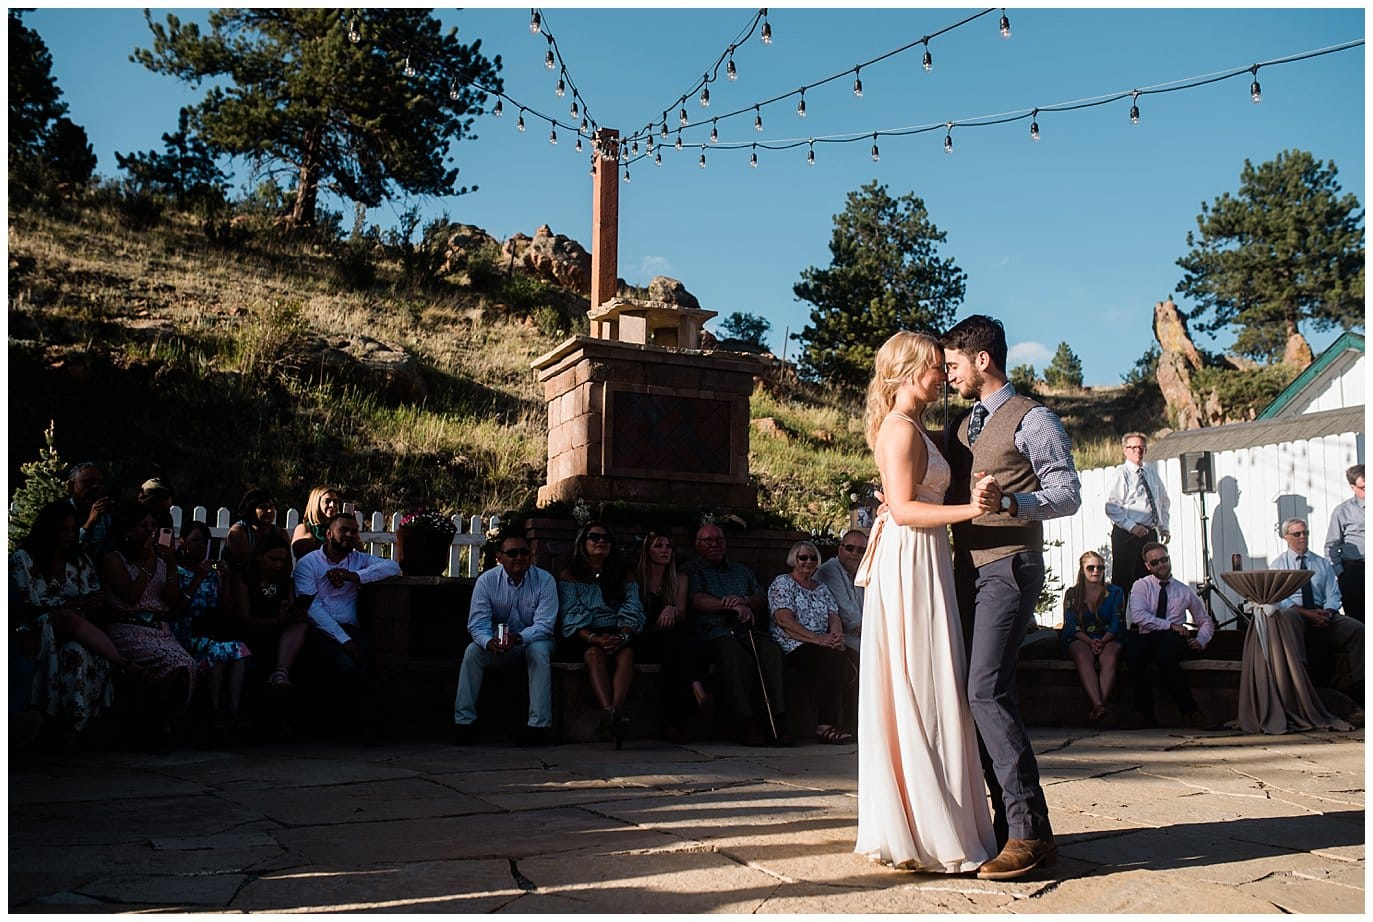 first dance on deer creek valley ranch outdoor patio at Deer Creek Valley Ranch wedding by Boulder Wedding Photographer Jennie Crate Photographer